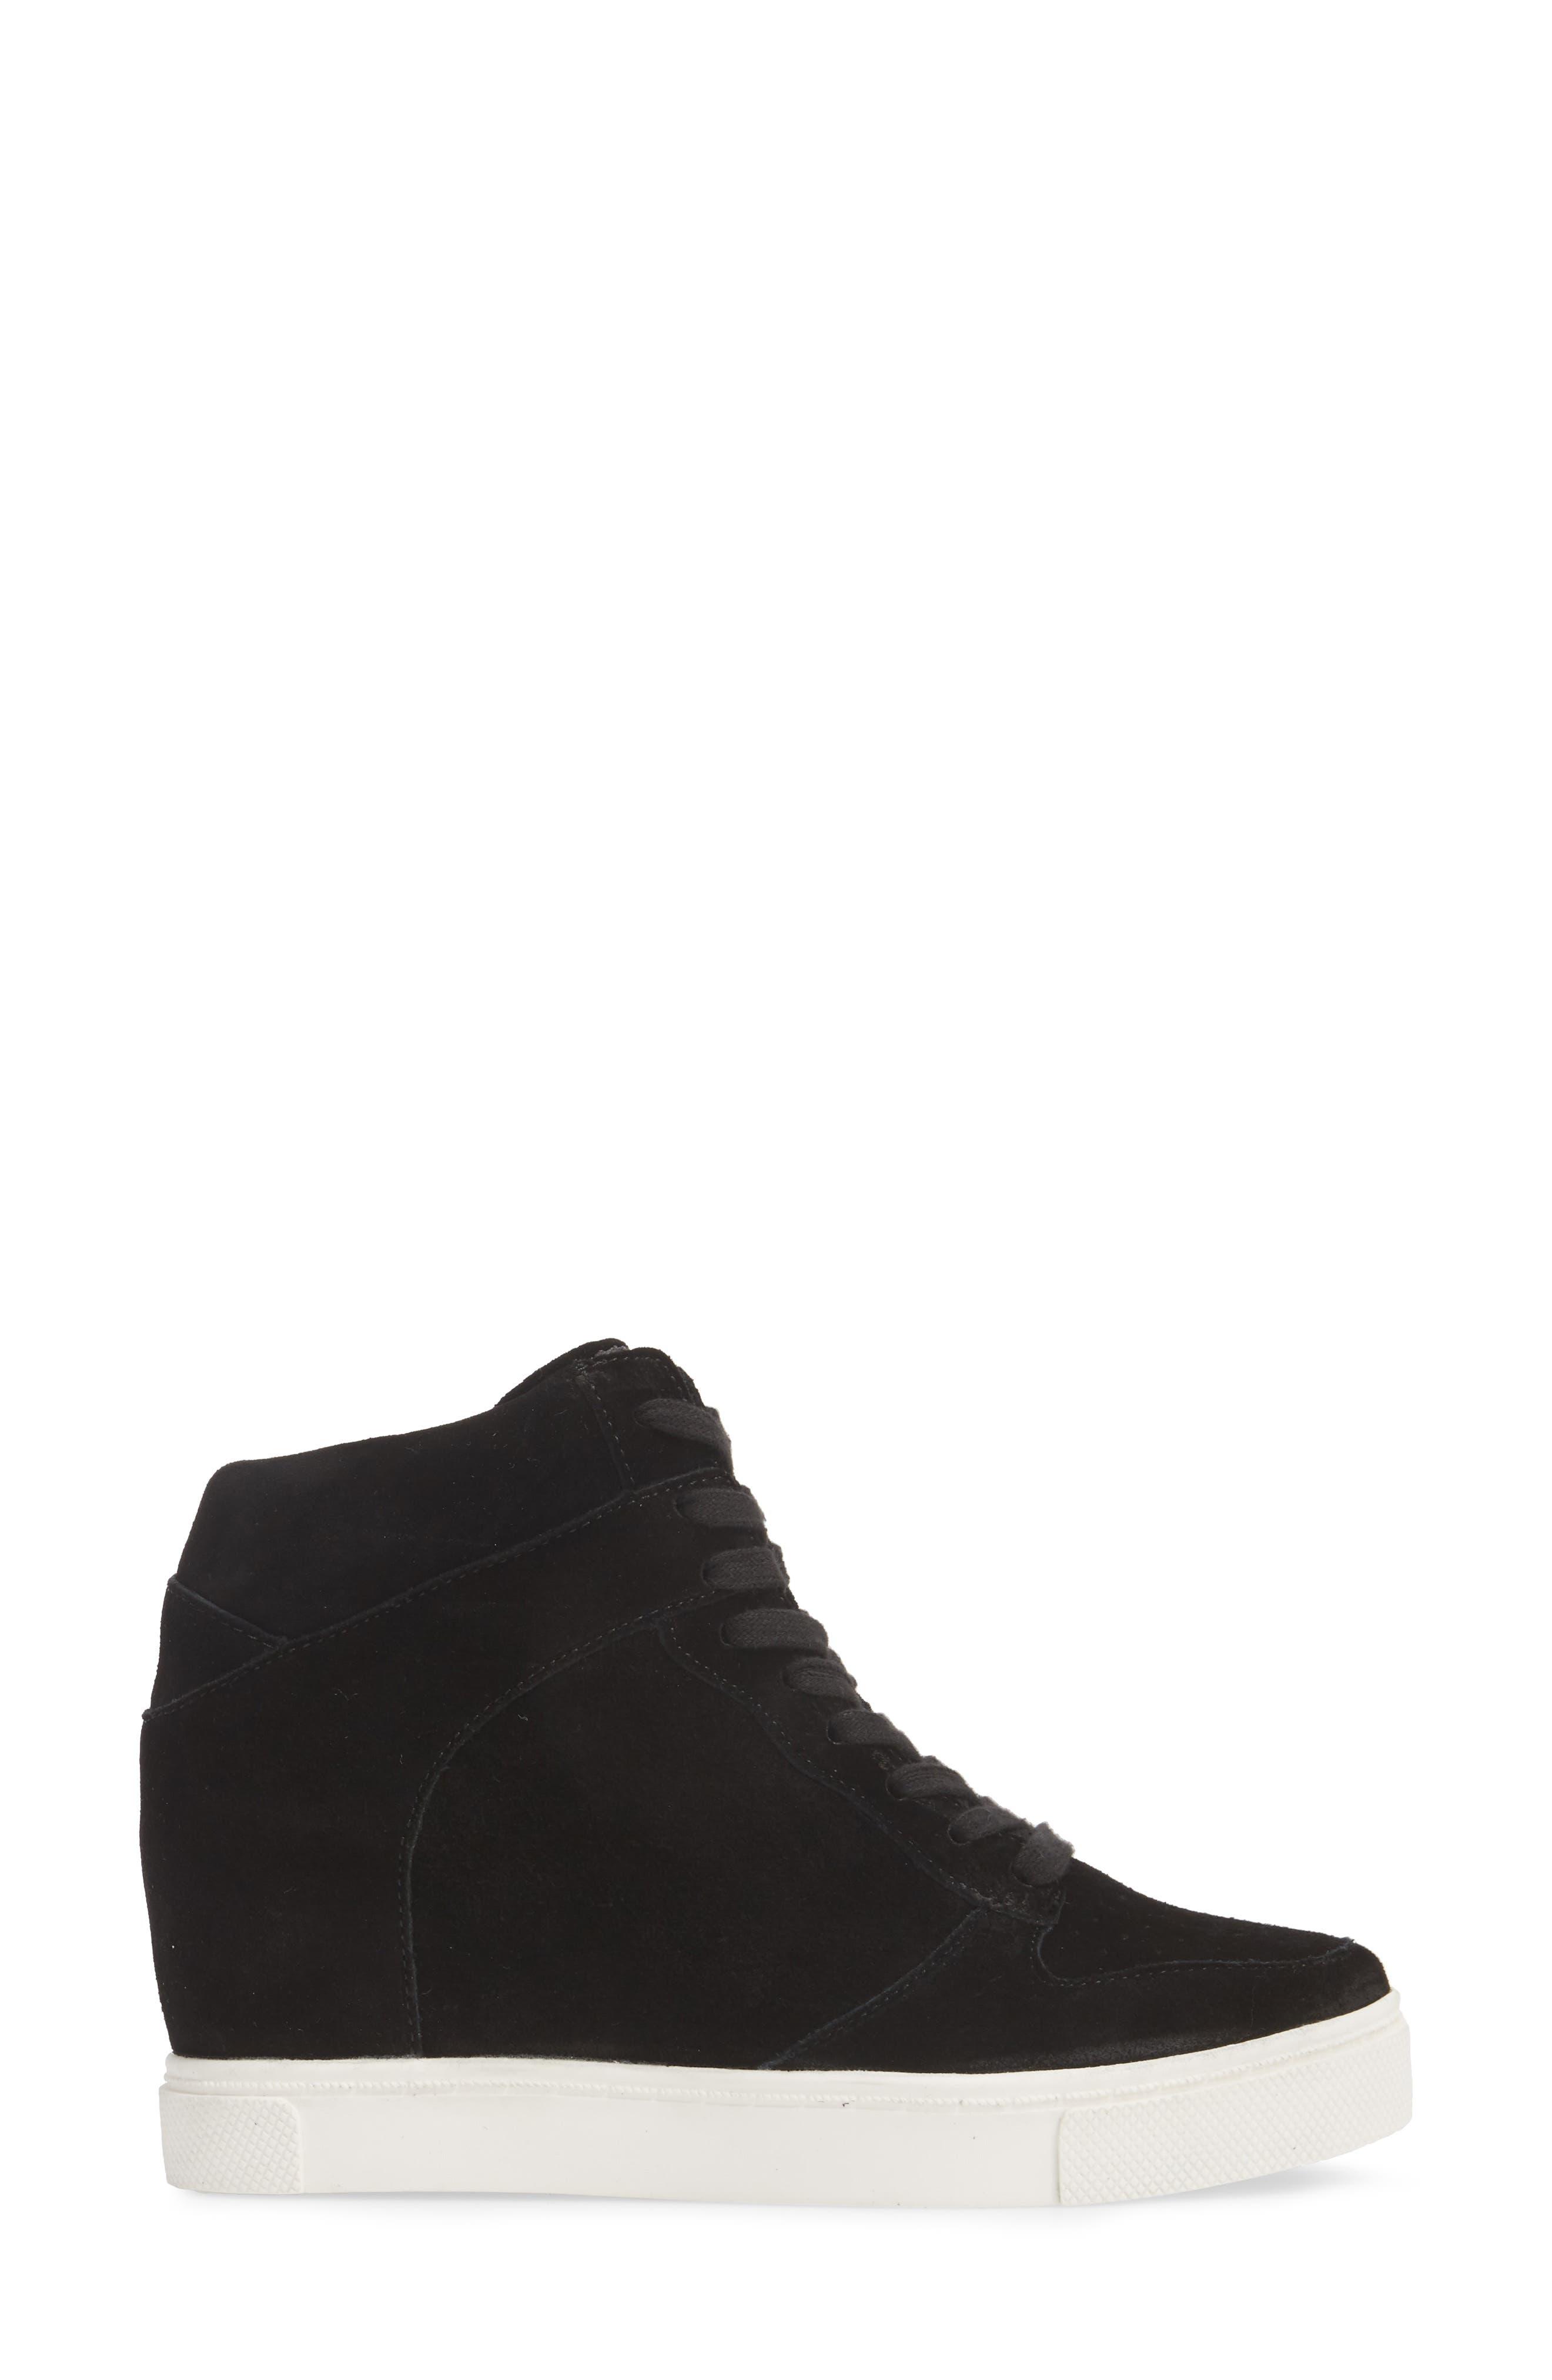 Noah Hidden Wedge Sneaker,                             Alternate thumbnail 3, color,                             006